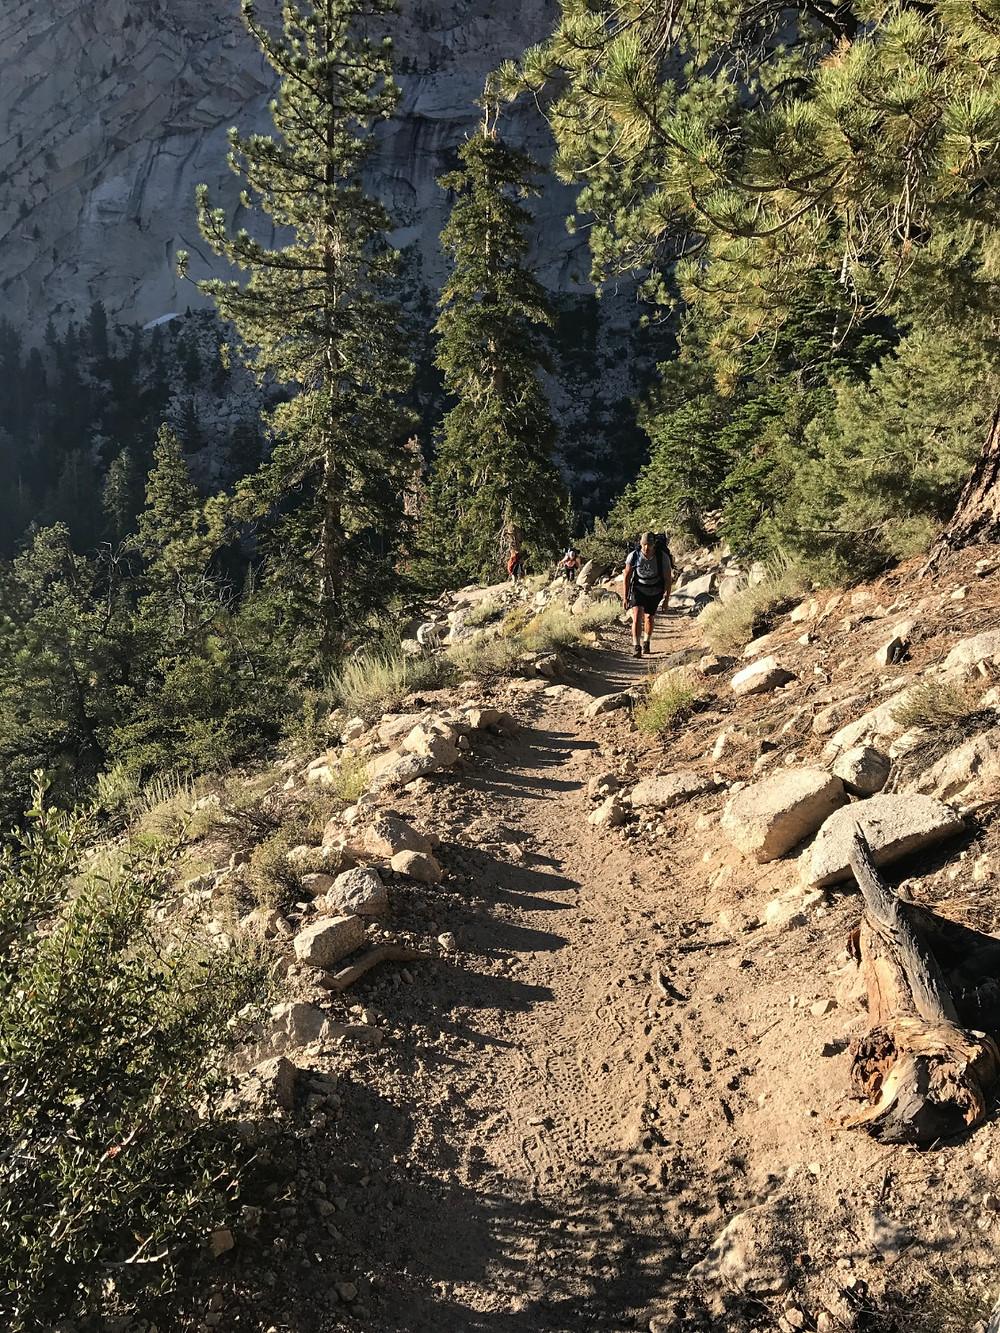 Mt Whitney trail starting climb